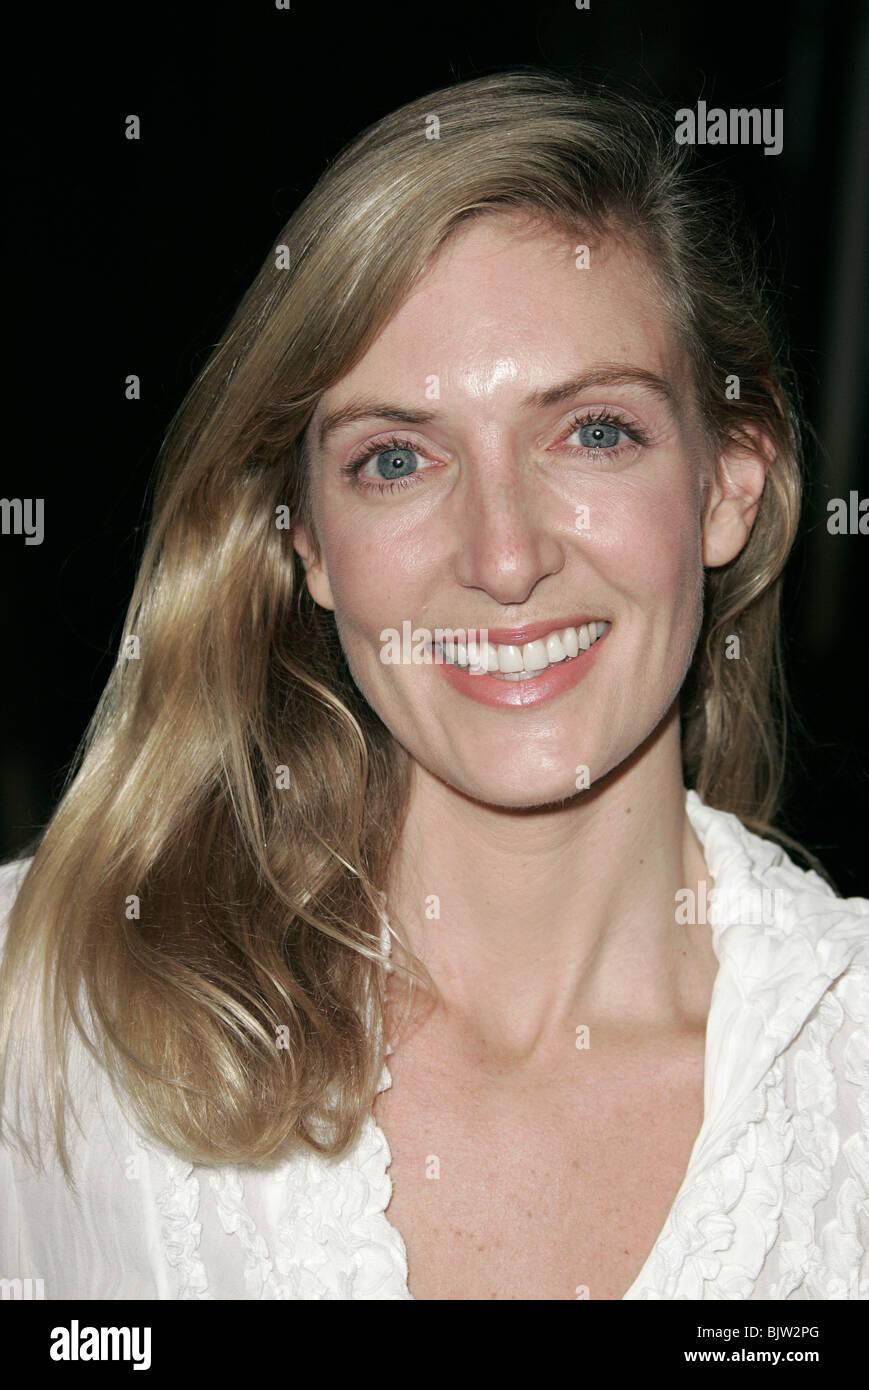 LYNNE LANGDON MEET THE FOCKERS WORLD FILM P CITYWALK UNIVERSAL STUDIOS LOS ANGELES USA 16 December 2004 - Stock Image